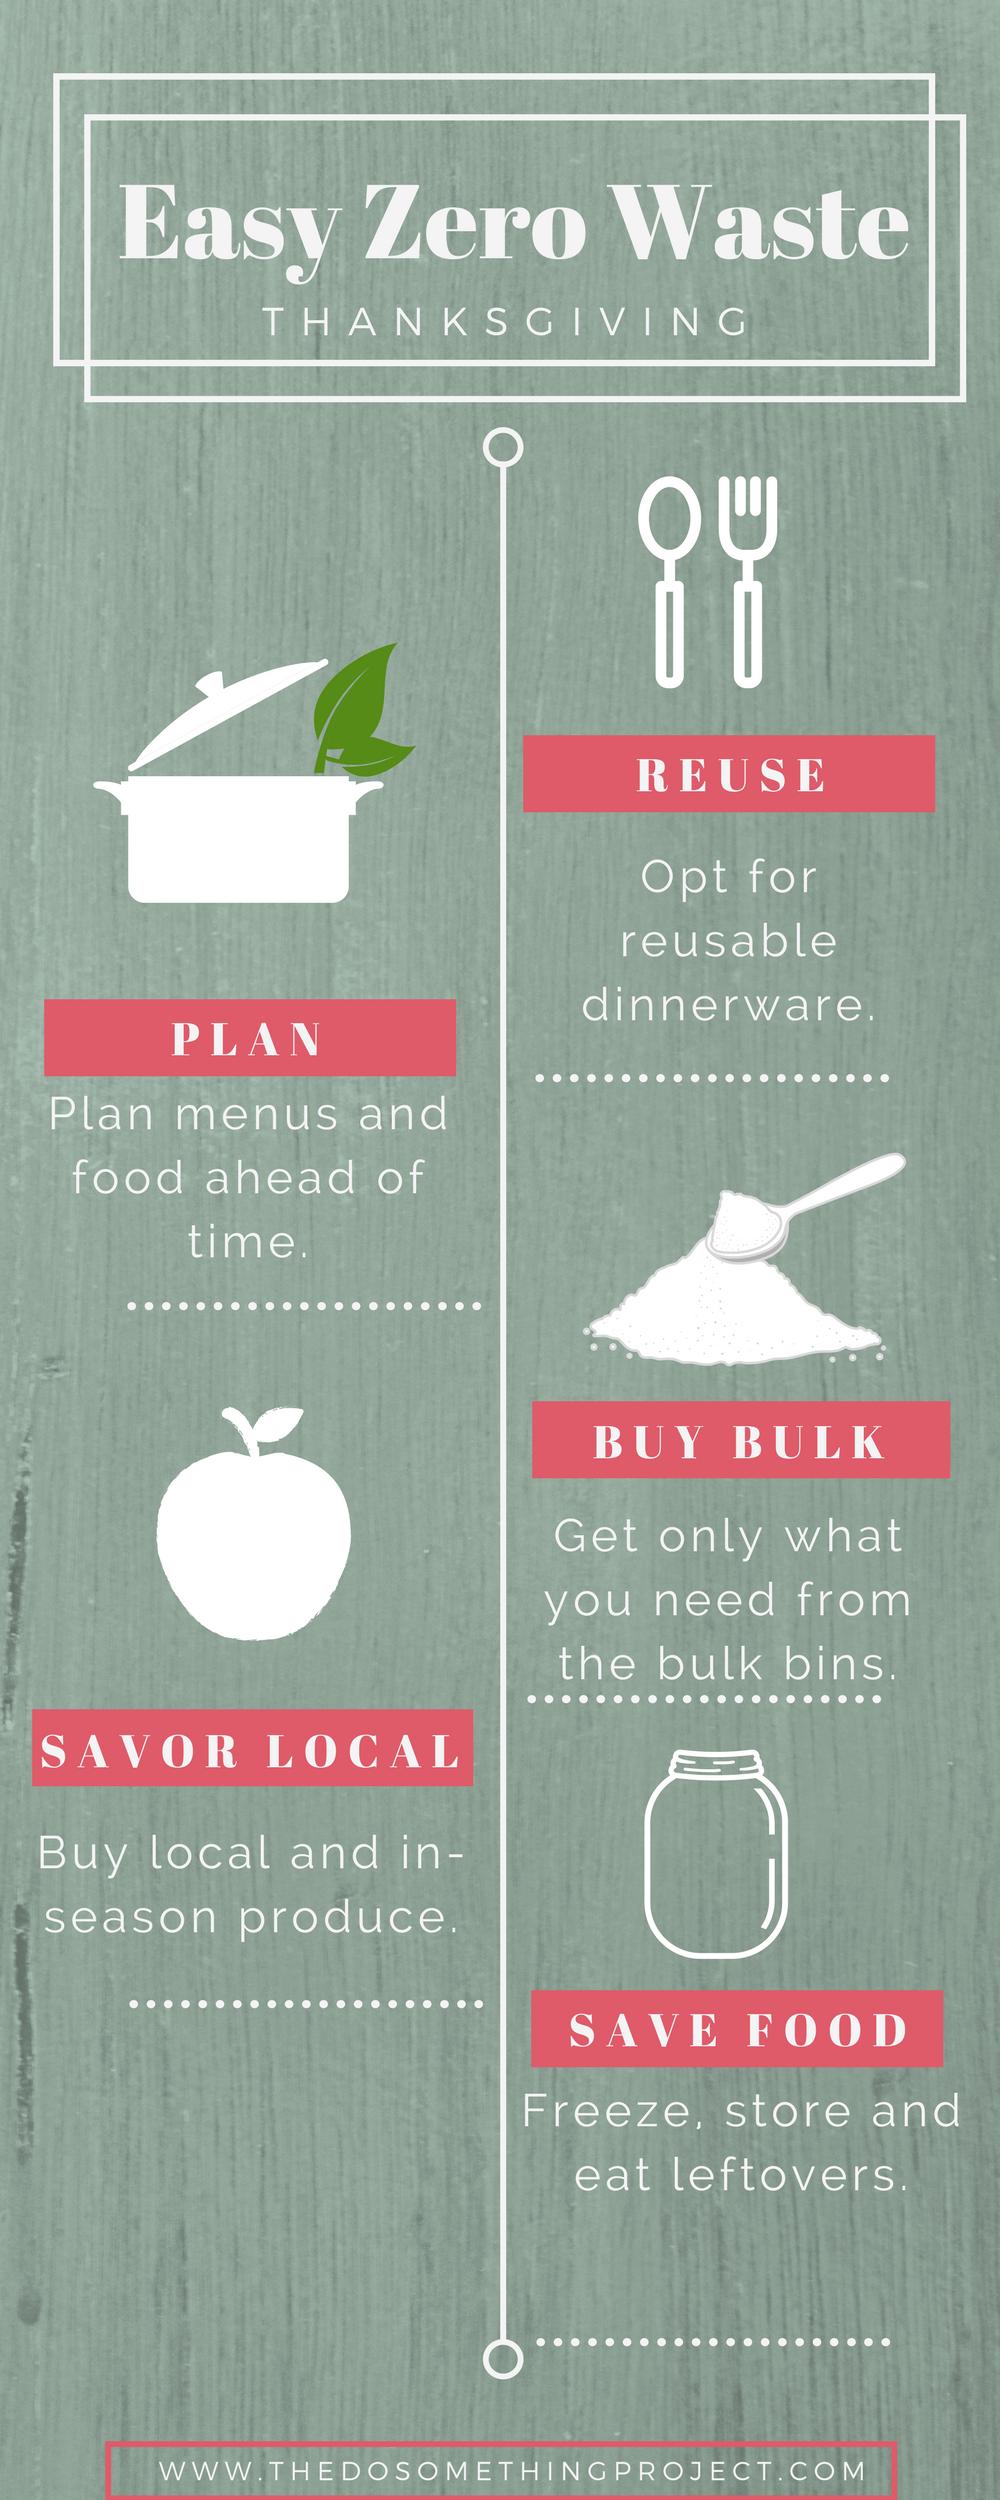 Zero Waste Thanksgiving Tips and Tricks